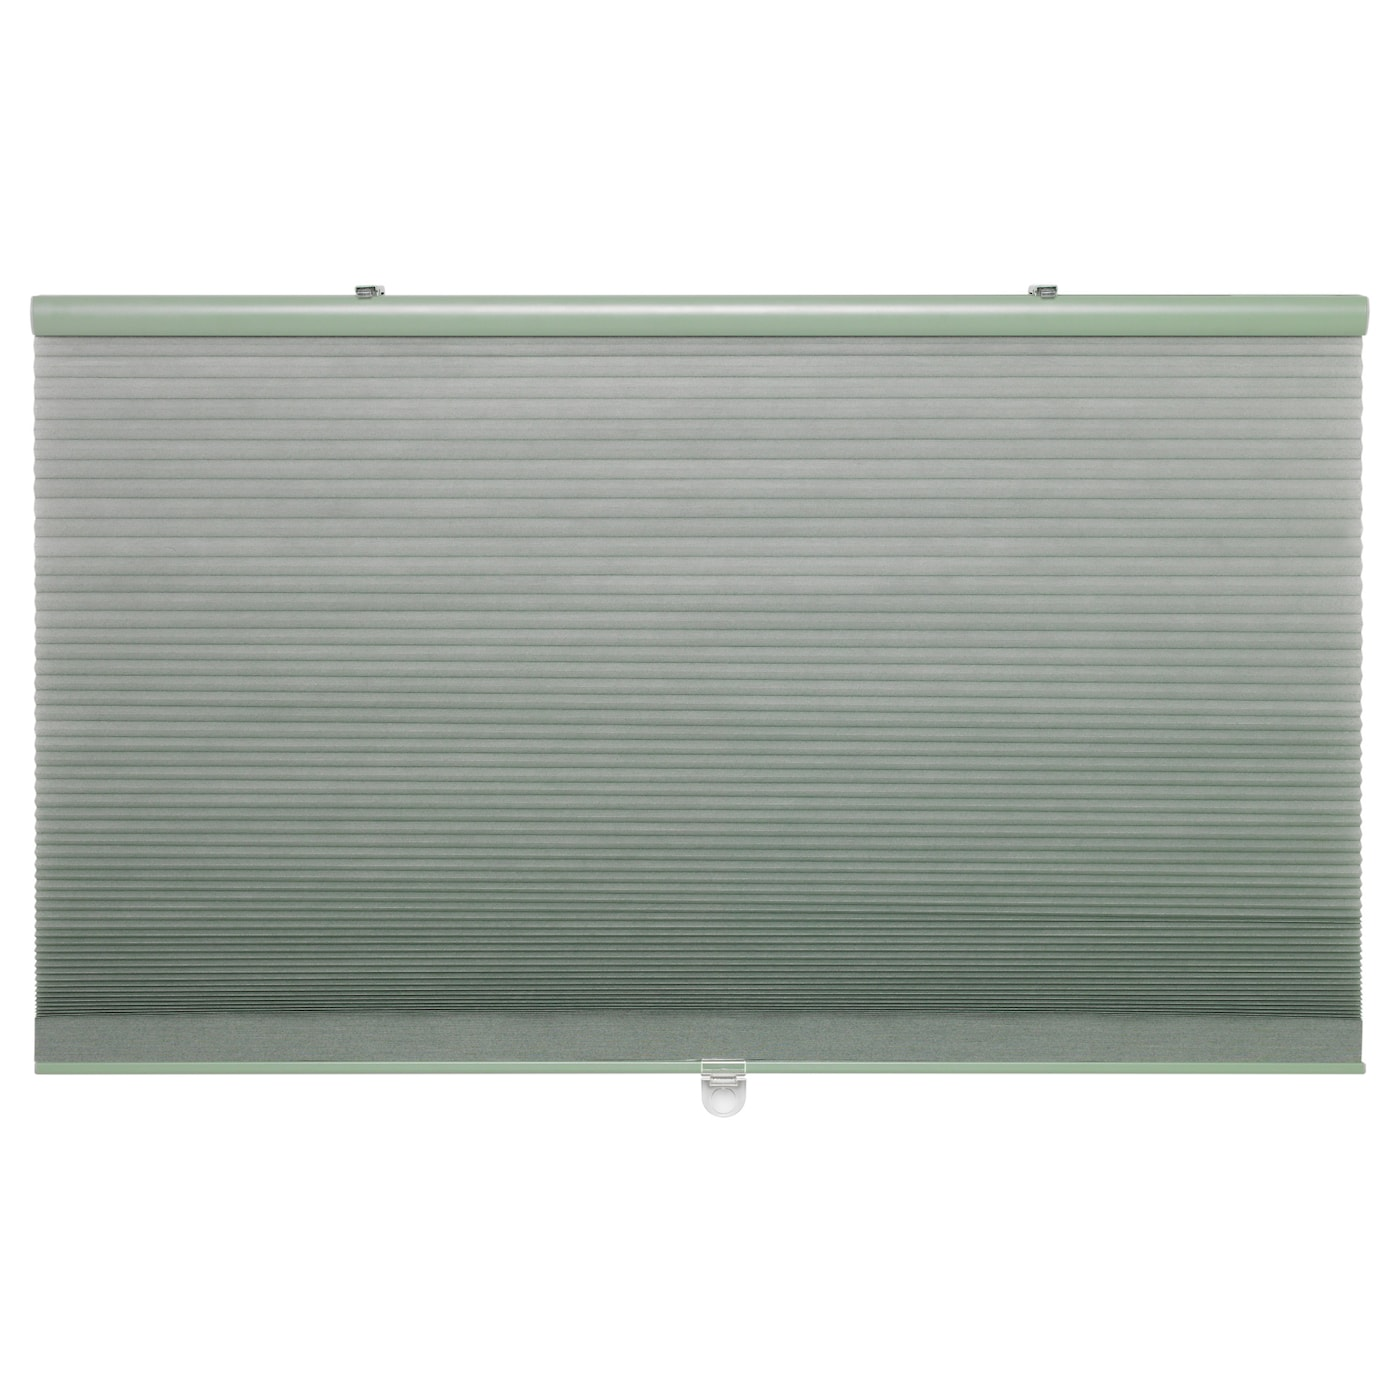 Ikea Sonnenschutz tupplur verdunklungsrollo 180x195 cm ikea